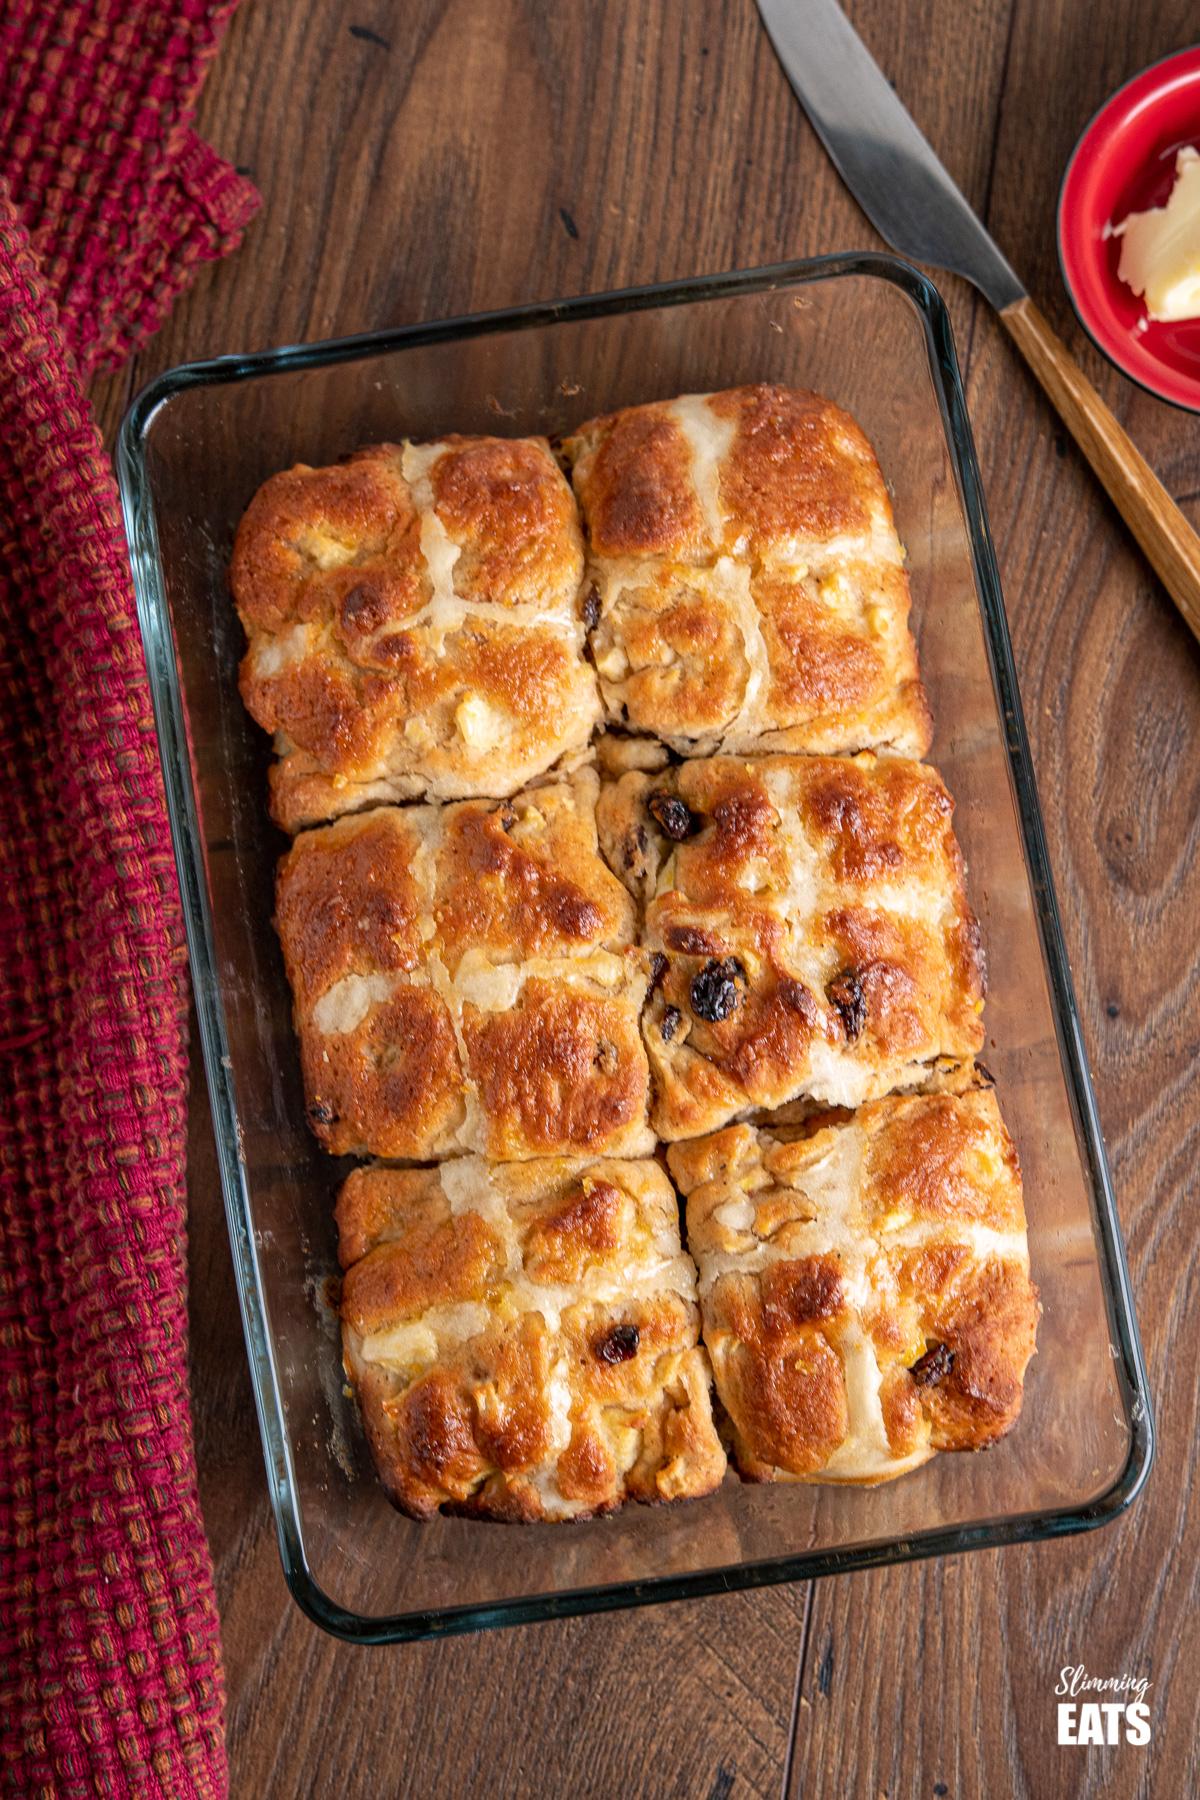 6 hot cross buns in a glass baking dish